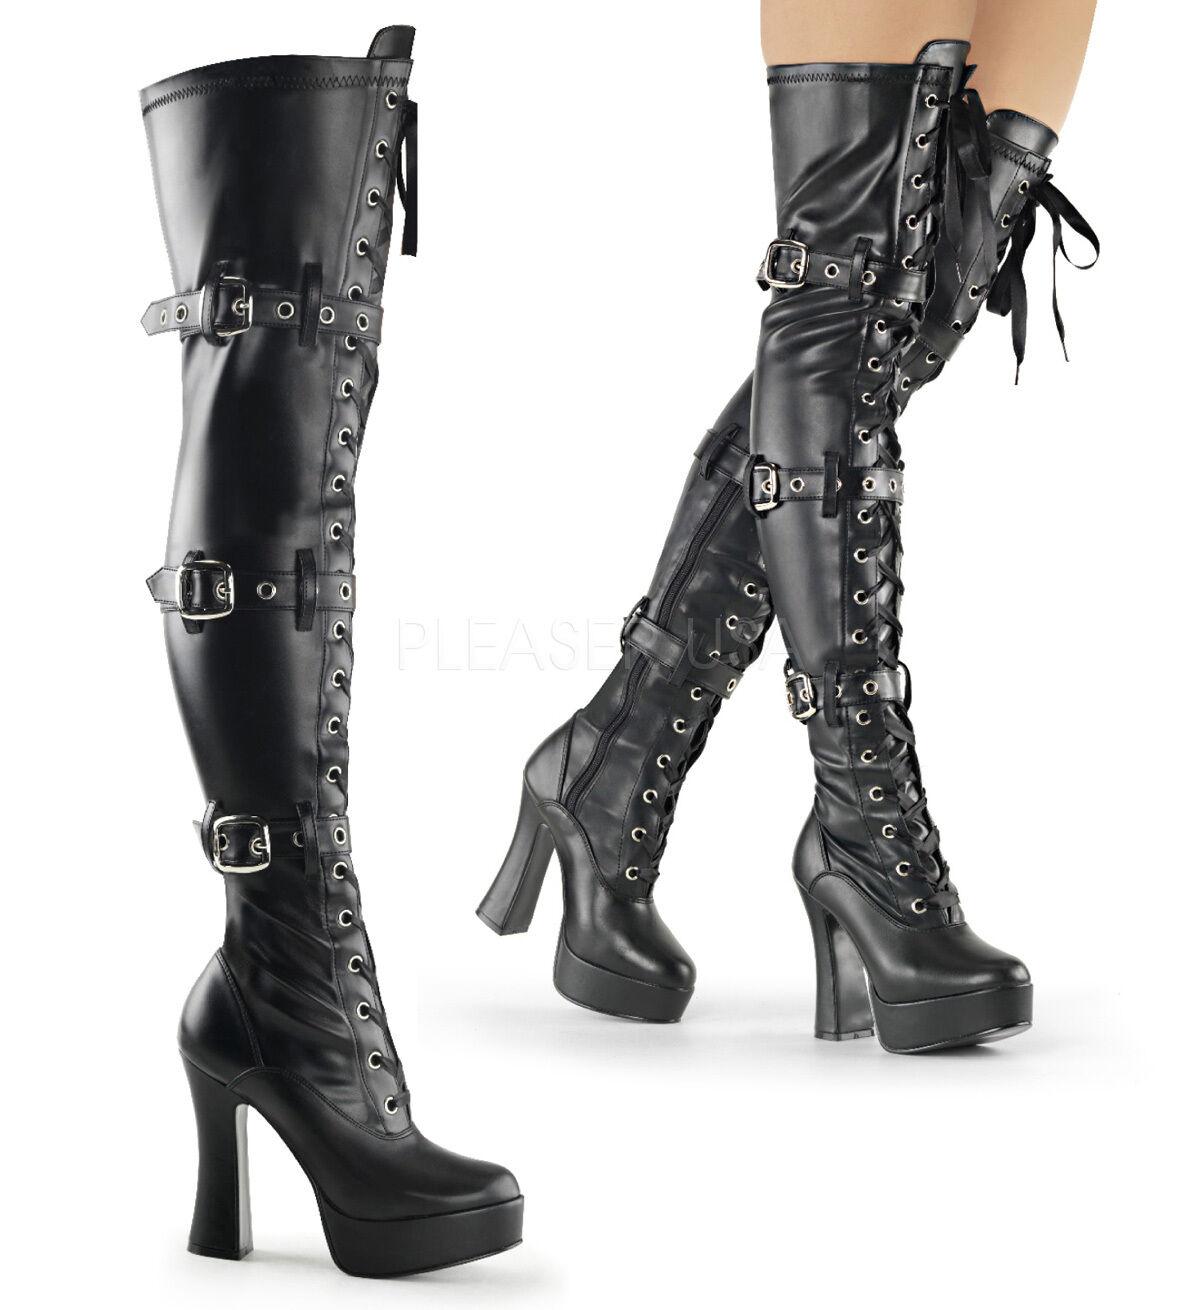 sconto online di vendita Pleaser Pleaser Pleaser Electra-3028 Matte nero Buckle Thigh High Platform Heel stivali - Gothic,  nessun minimo